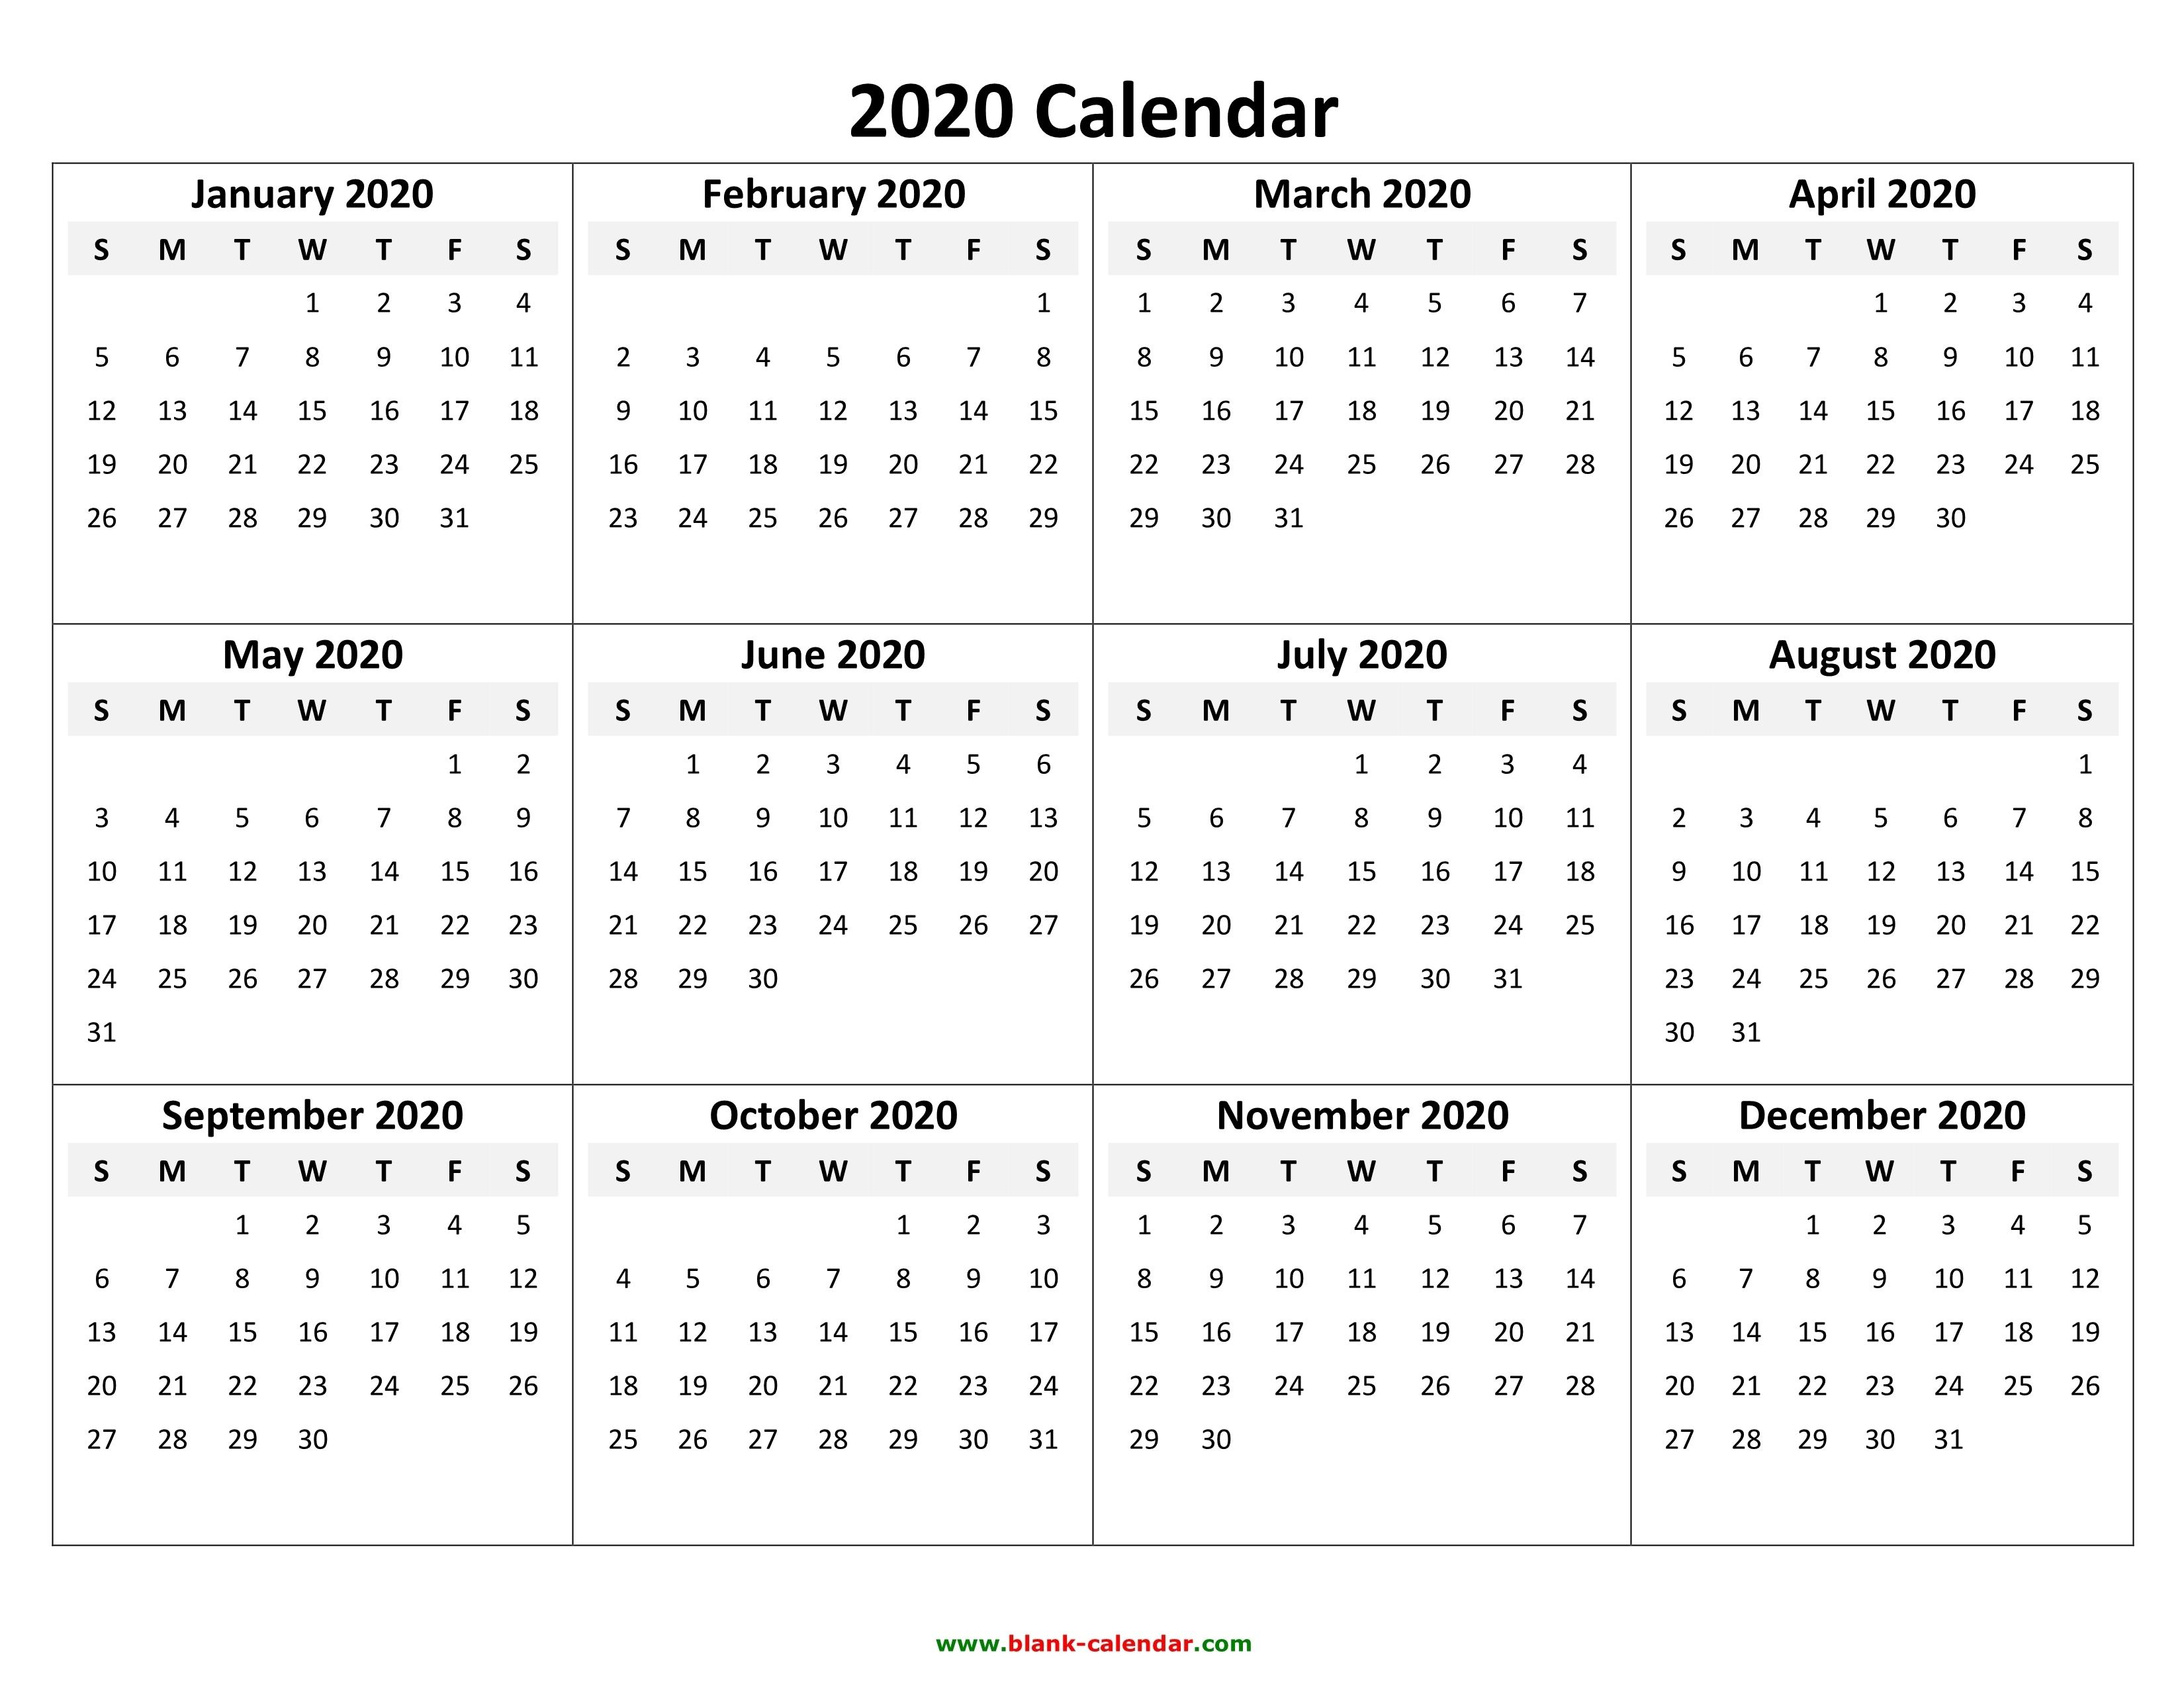 Calendar Template 2020 | One Page Calendar Printable